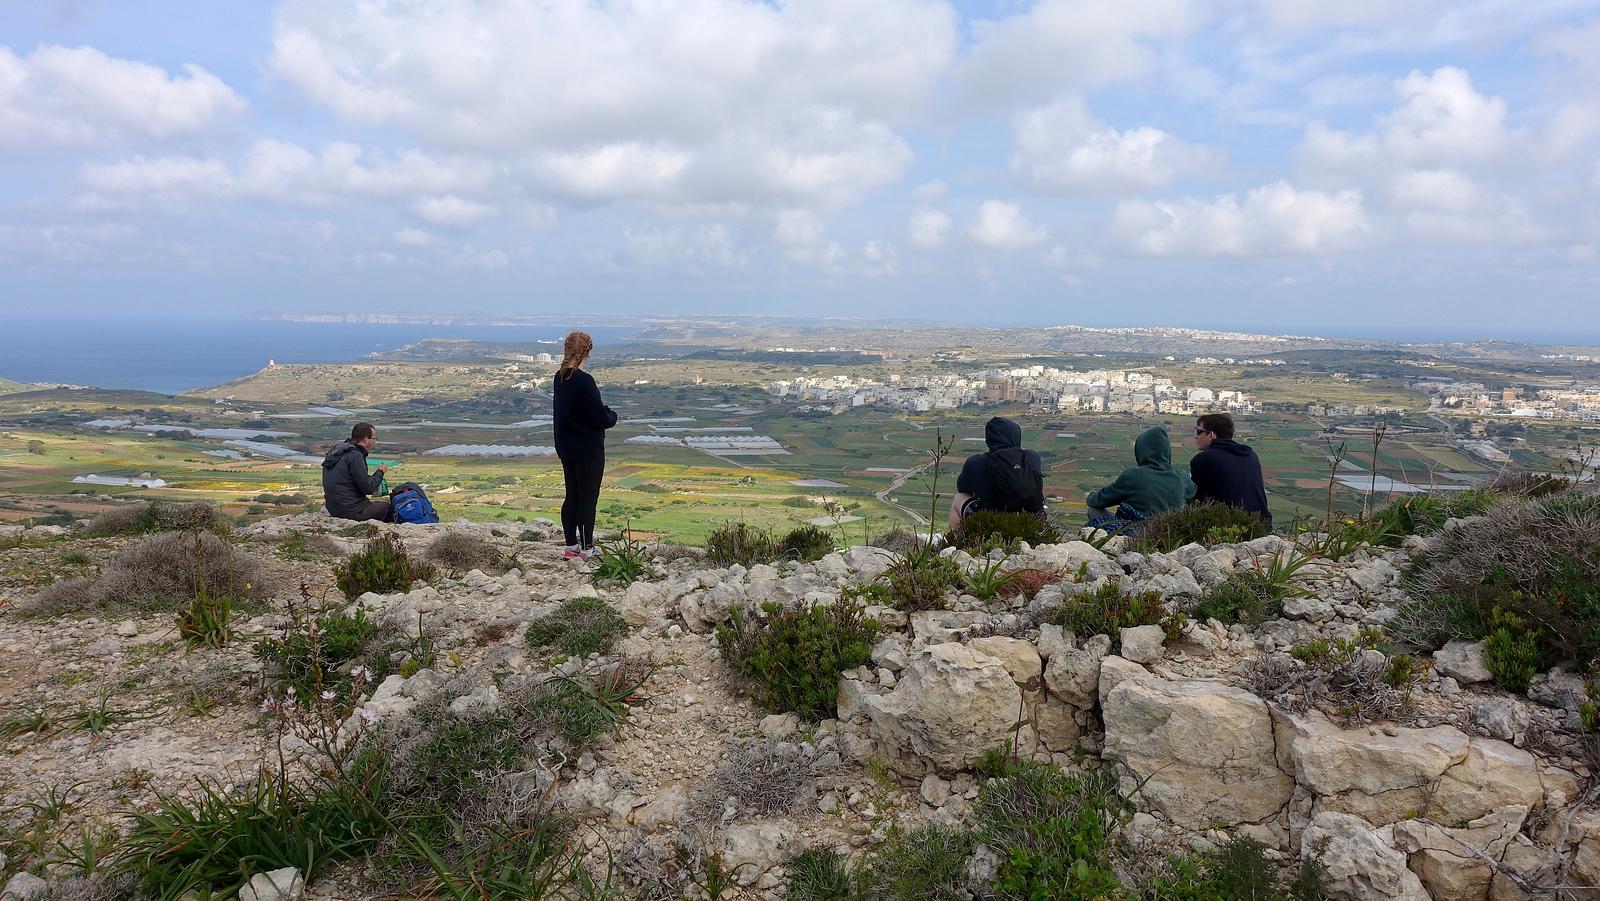 Malta Pictures - Victoria Lines Trek